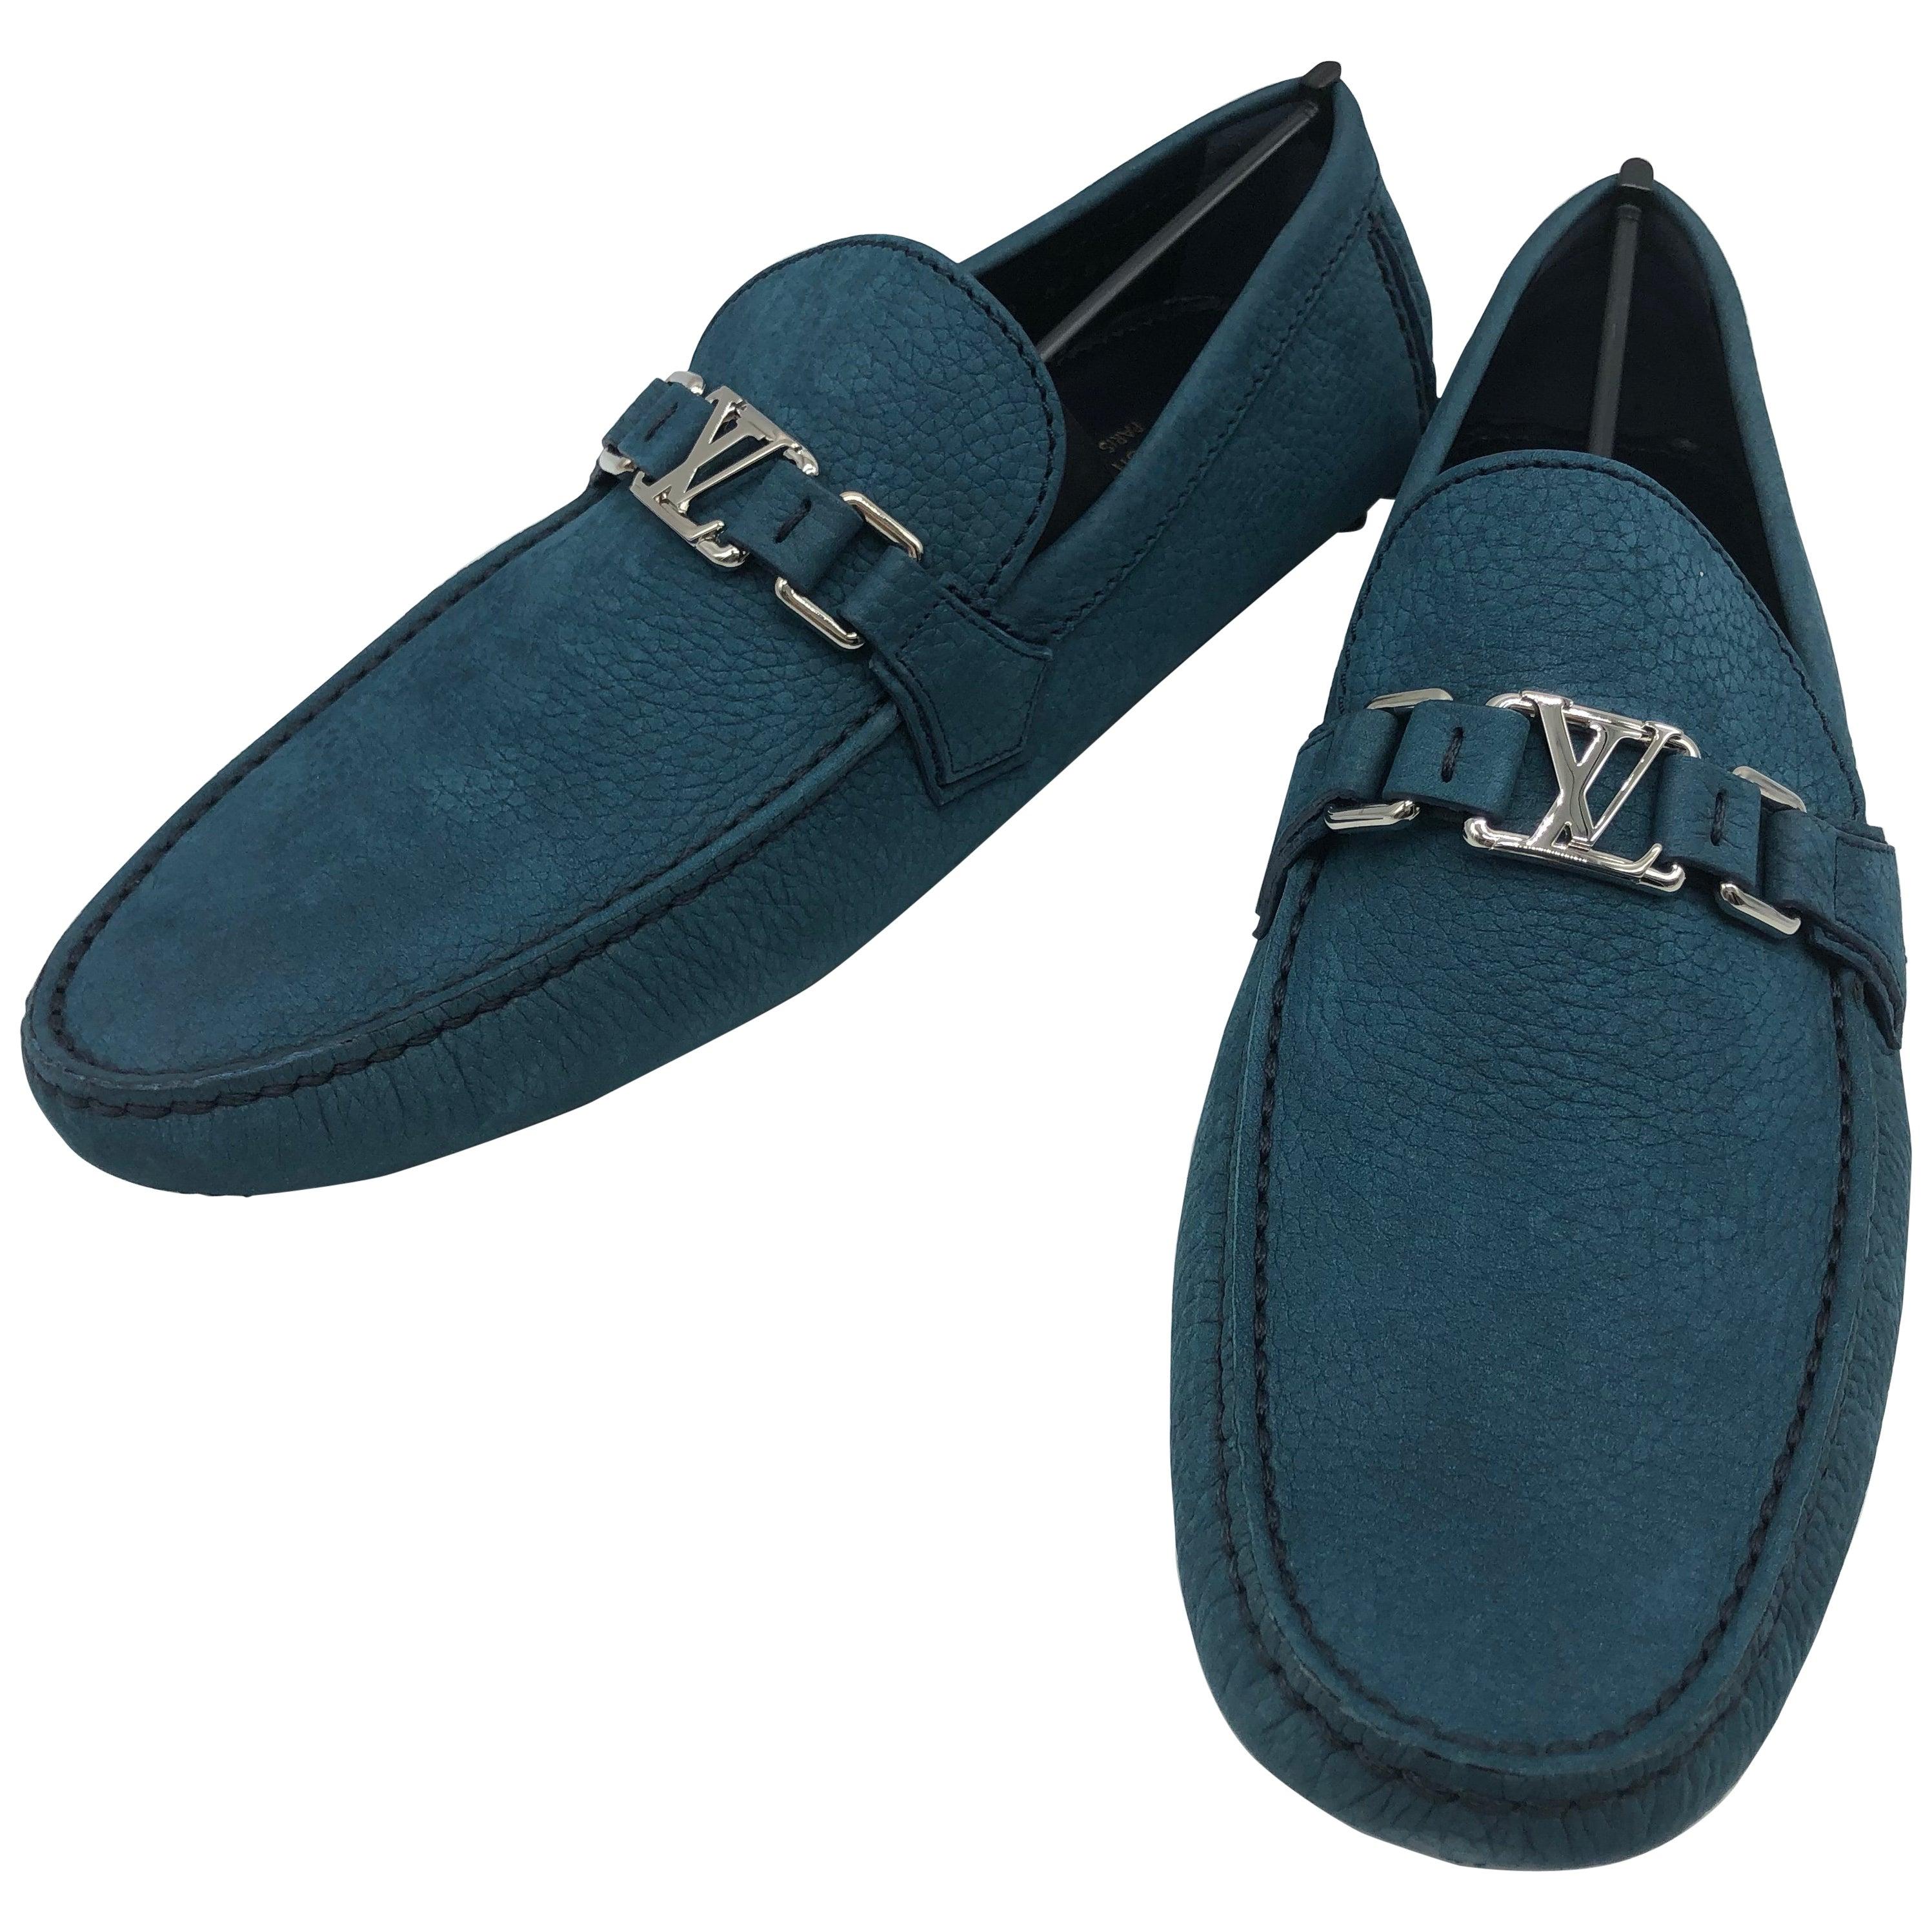 5d8cff3e09c Louis Vuitton men Loafers in blue suede // Model: Hockenheim // Size: 10 //  New